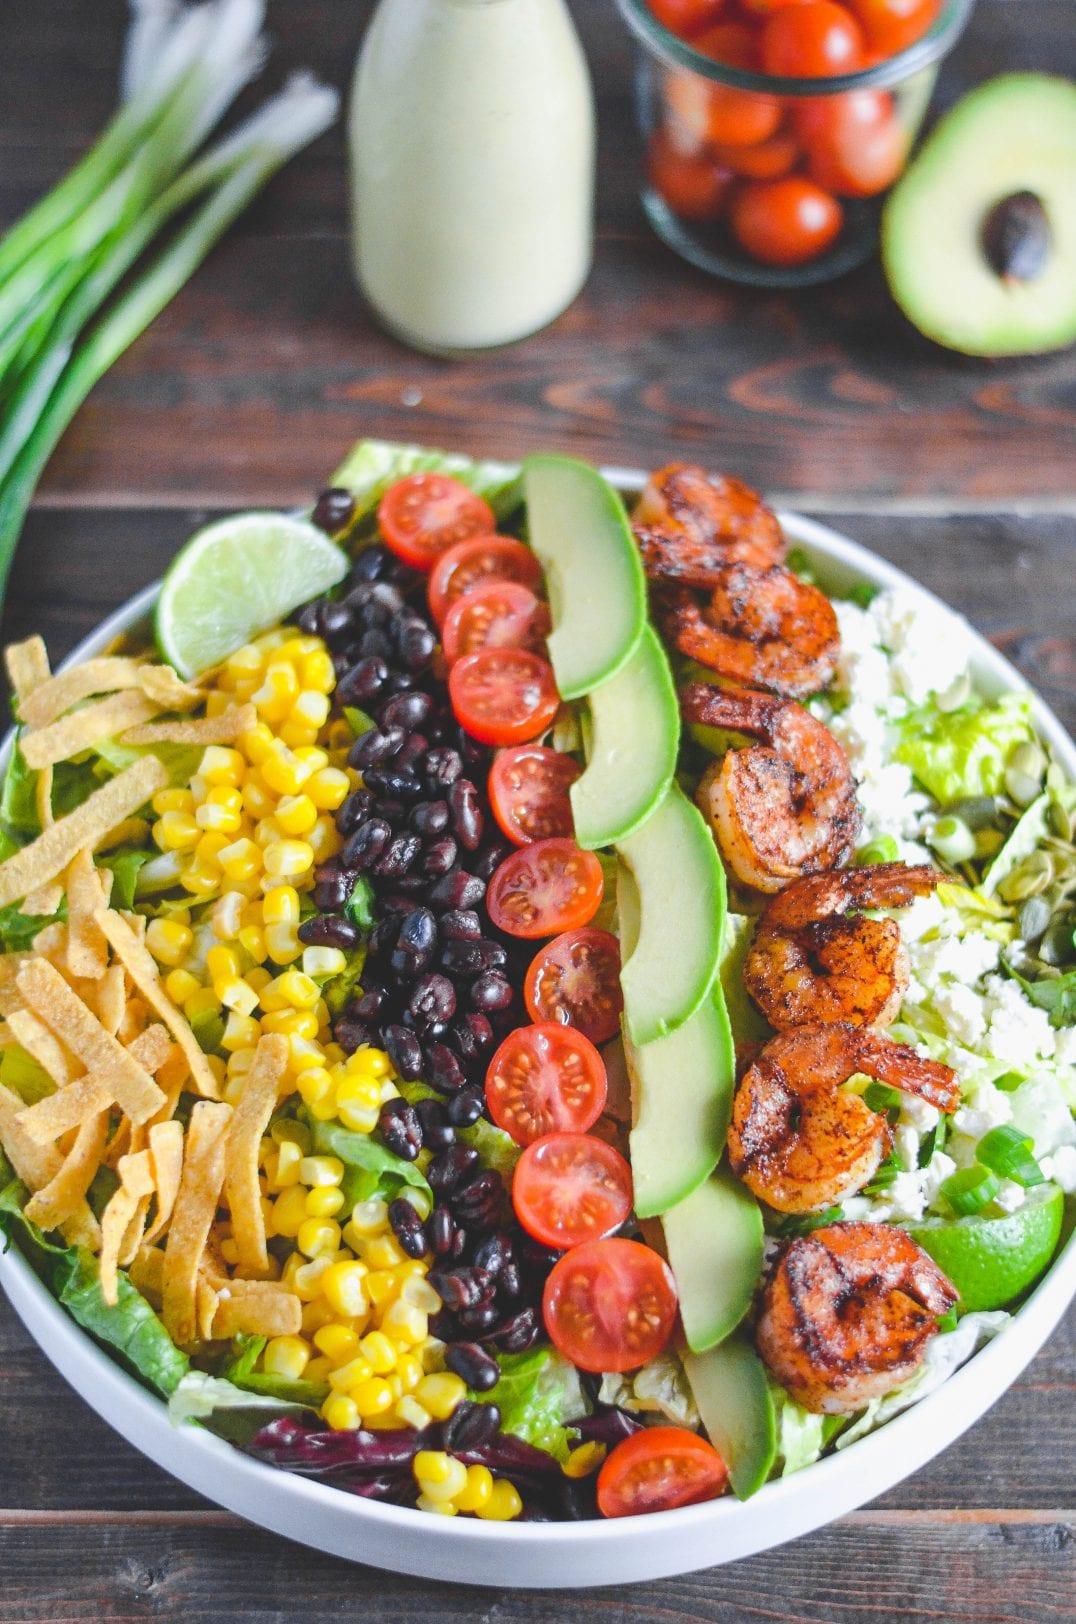 Southwest Fiesta Shrimp Salad